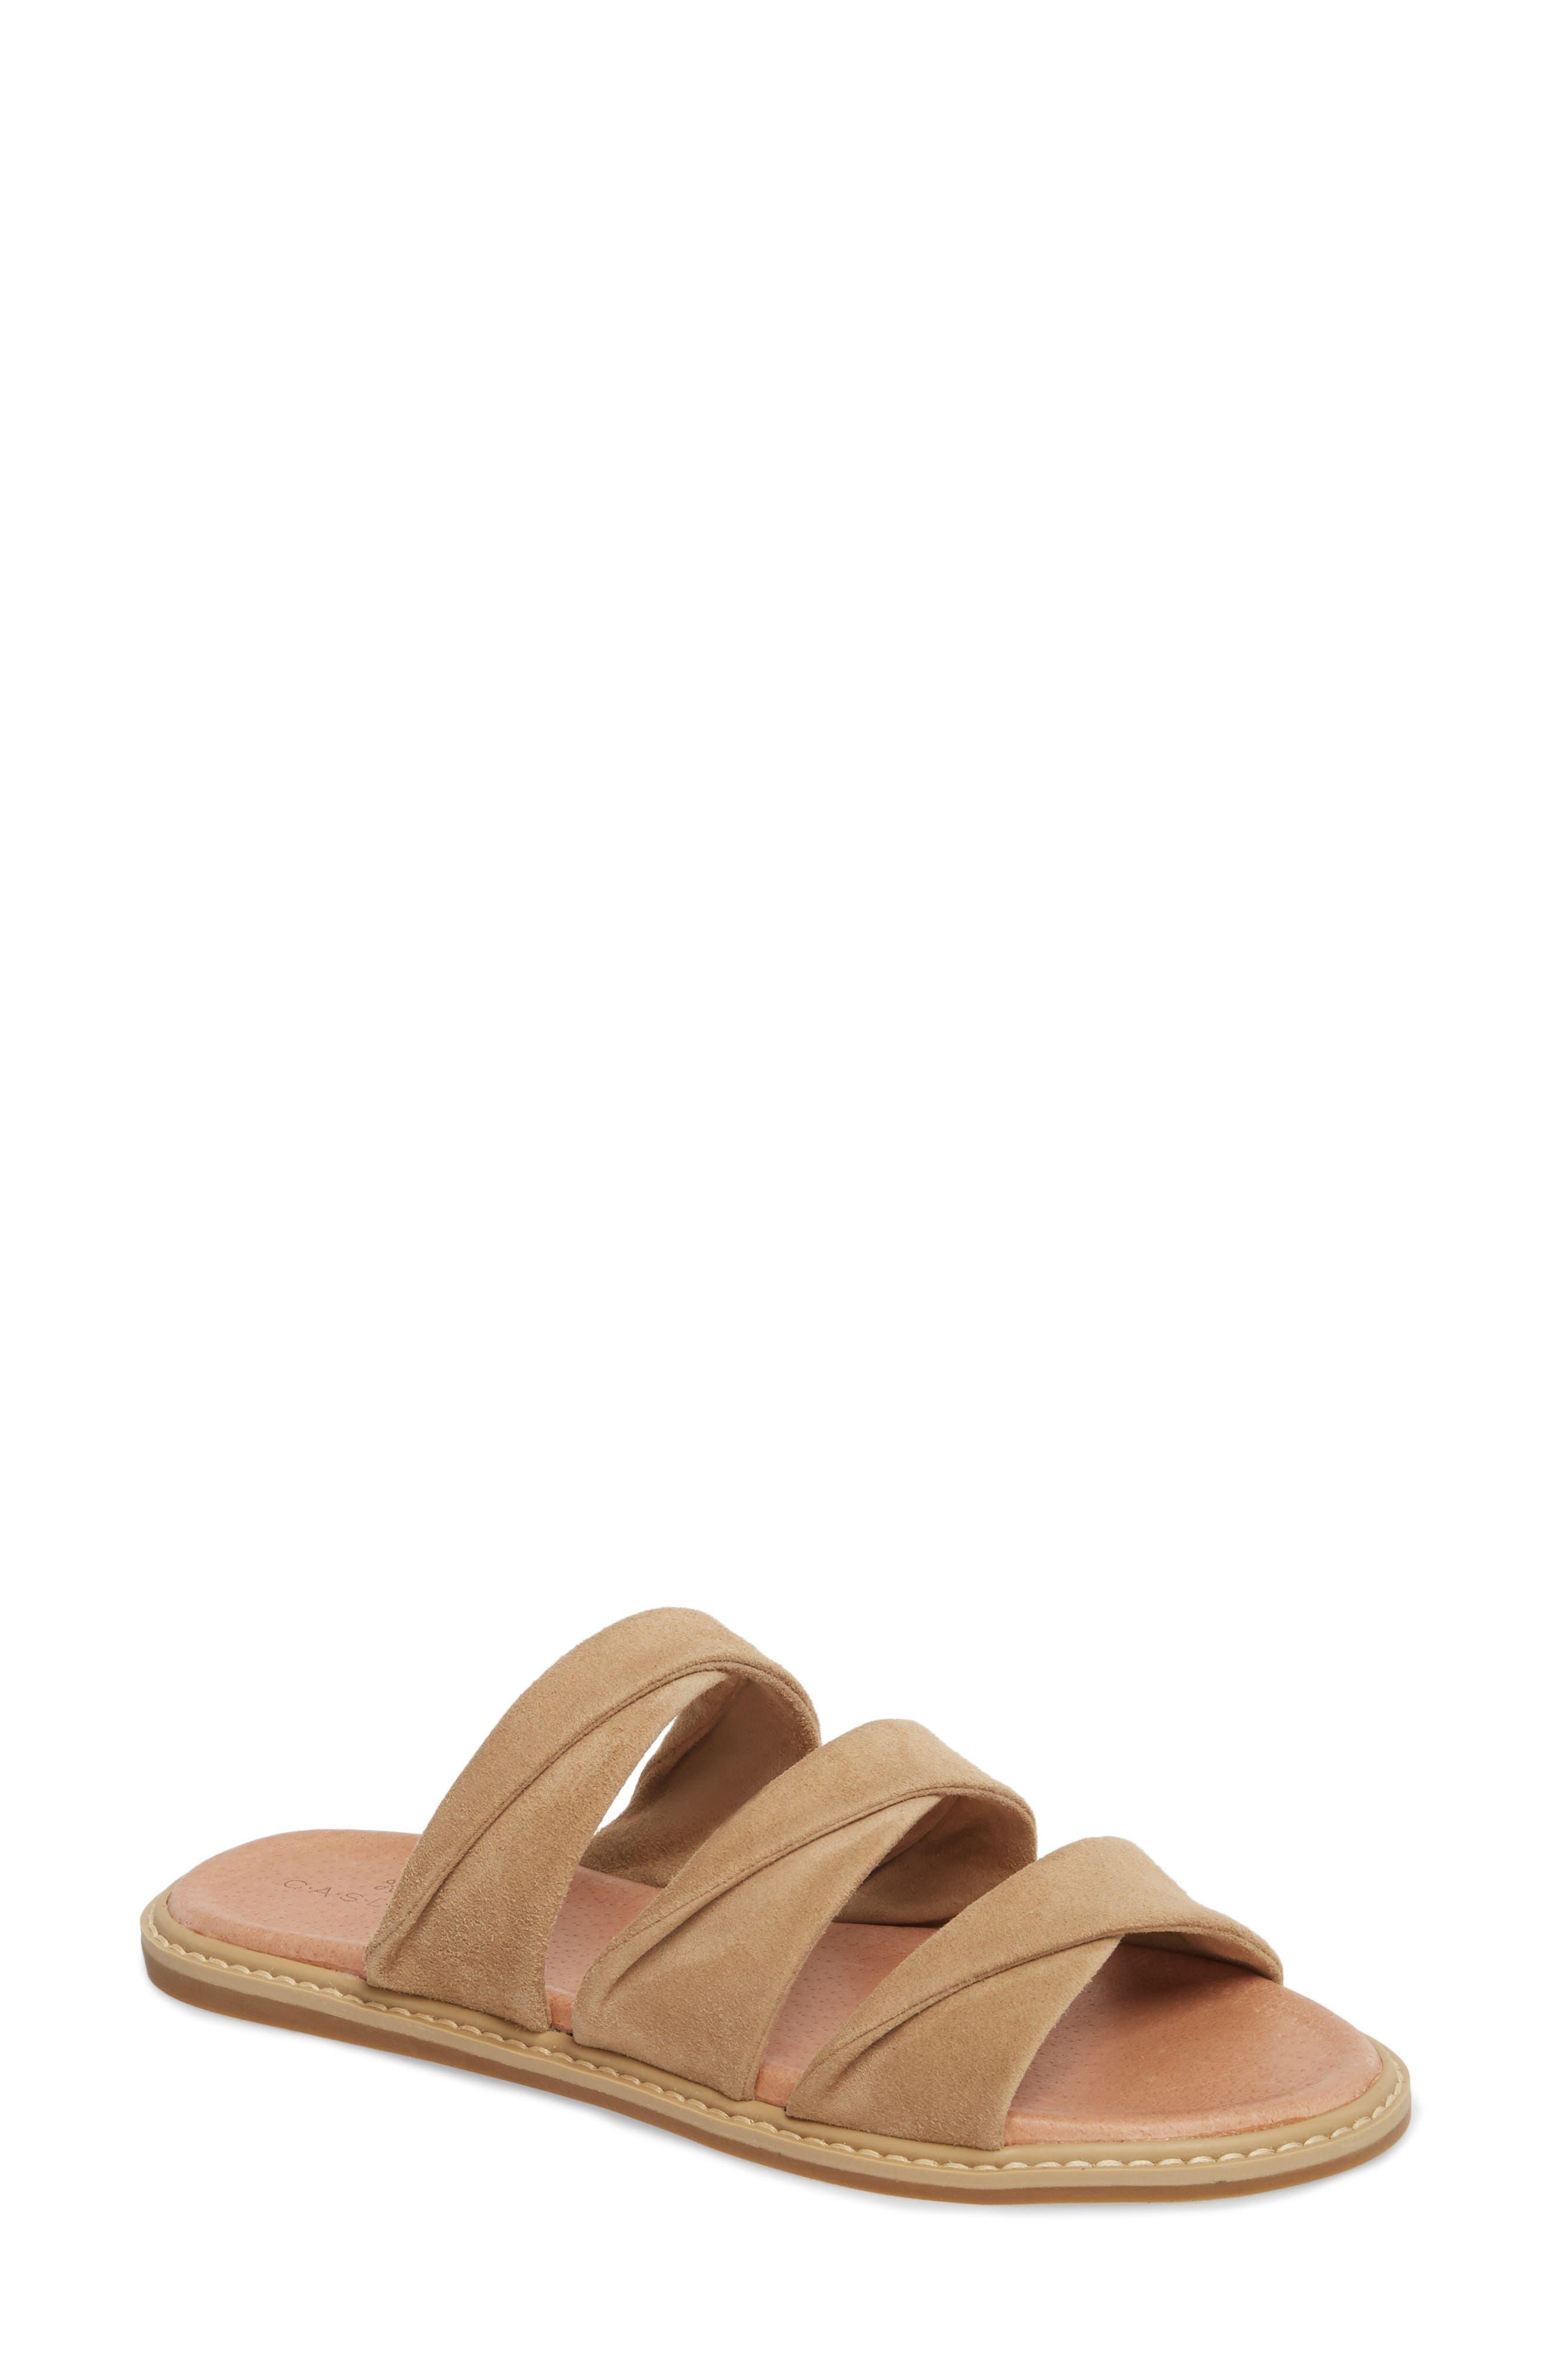 Cooper Slide Sandal,                             Main thumbnail 1, color,